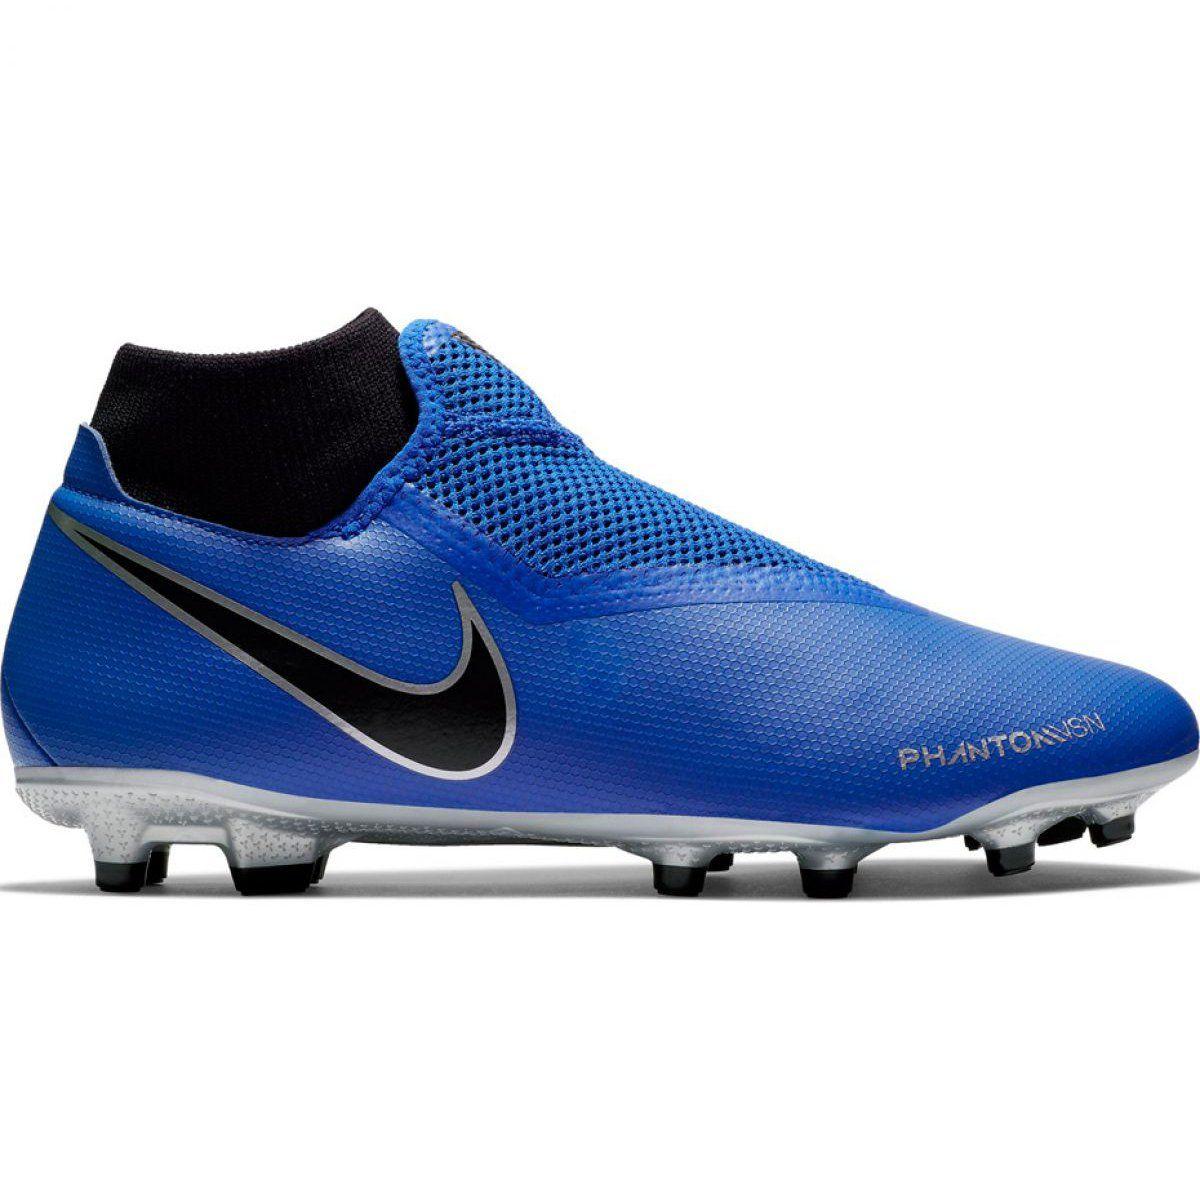 Corks Football Sport Nike Nike Phantom Vsn Academy Df Fg Mg M Ao3258 400 Football Shoes Black Football Shoes Phantom Vision Football Boots